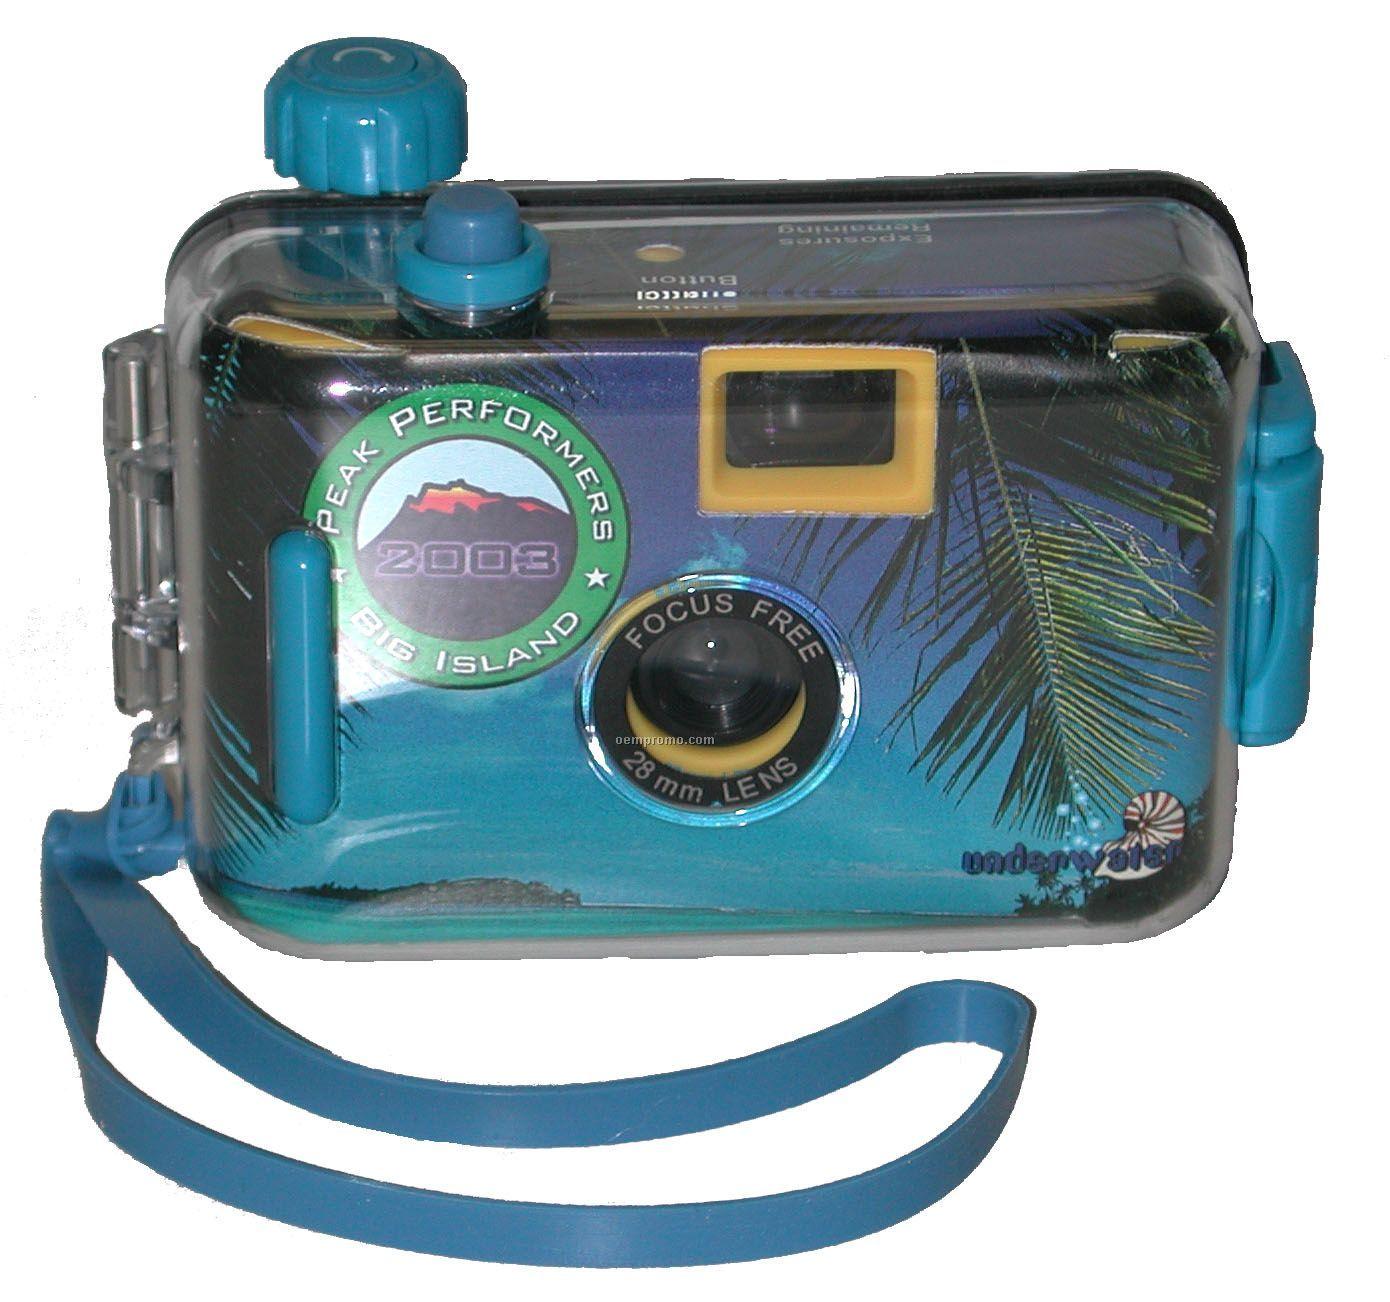 Custom Disposable Waterproof Camera W/27 Exposures